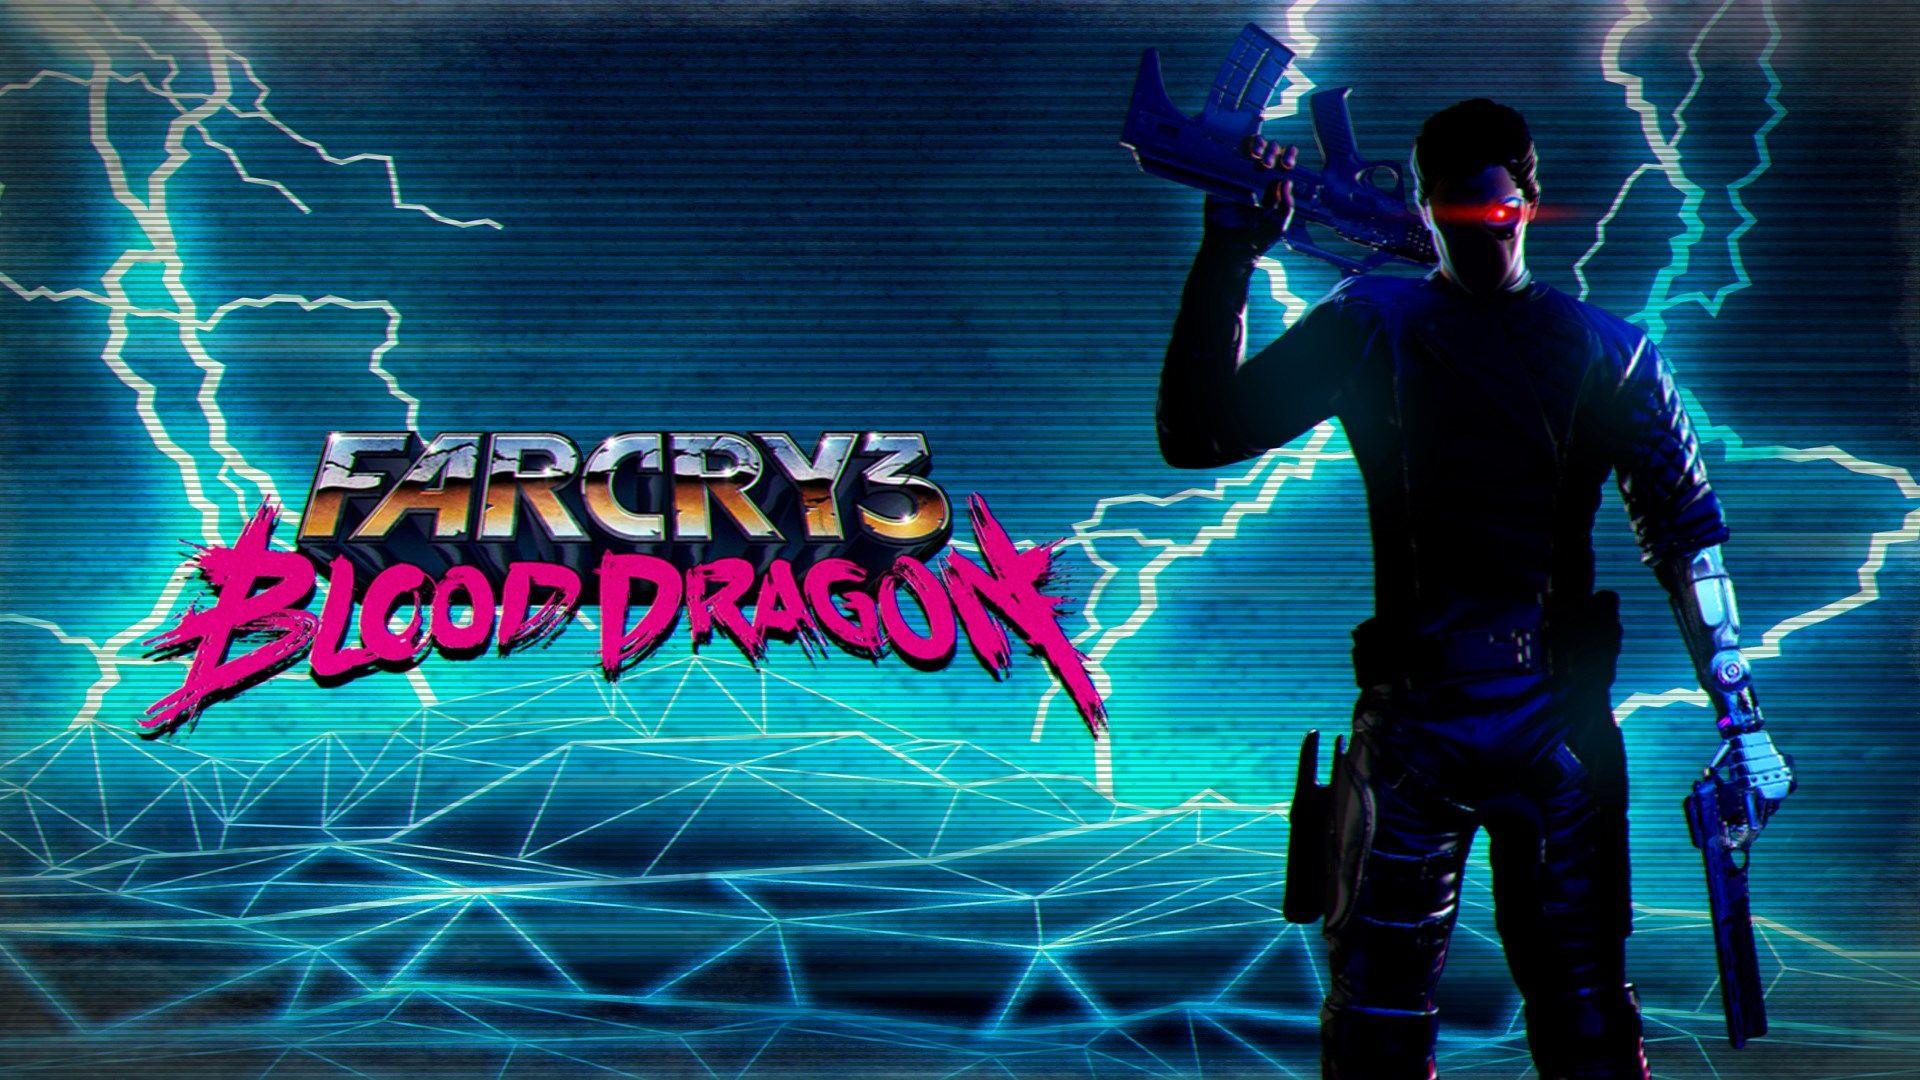 1848584 Far Cry 3 Blood Dragon Category Free Computer Far Cry 3